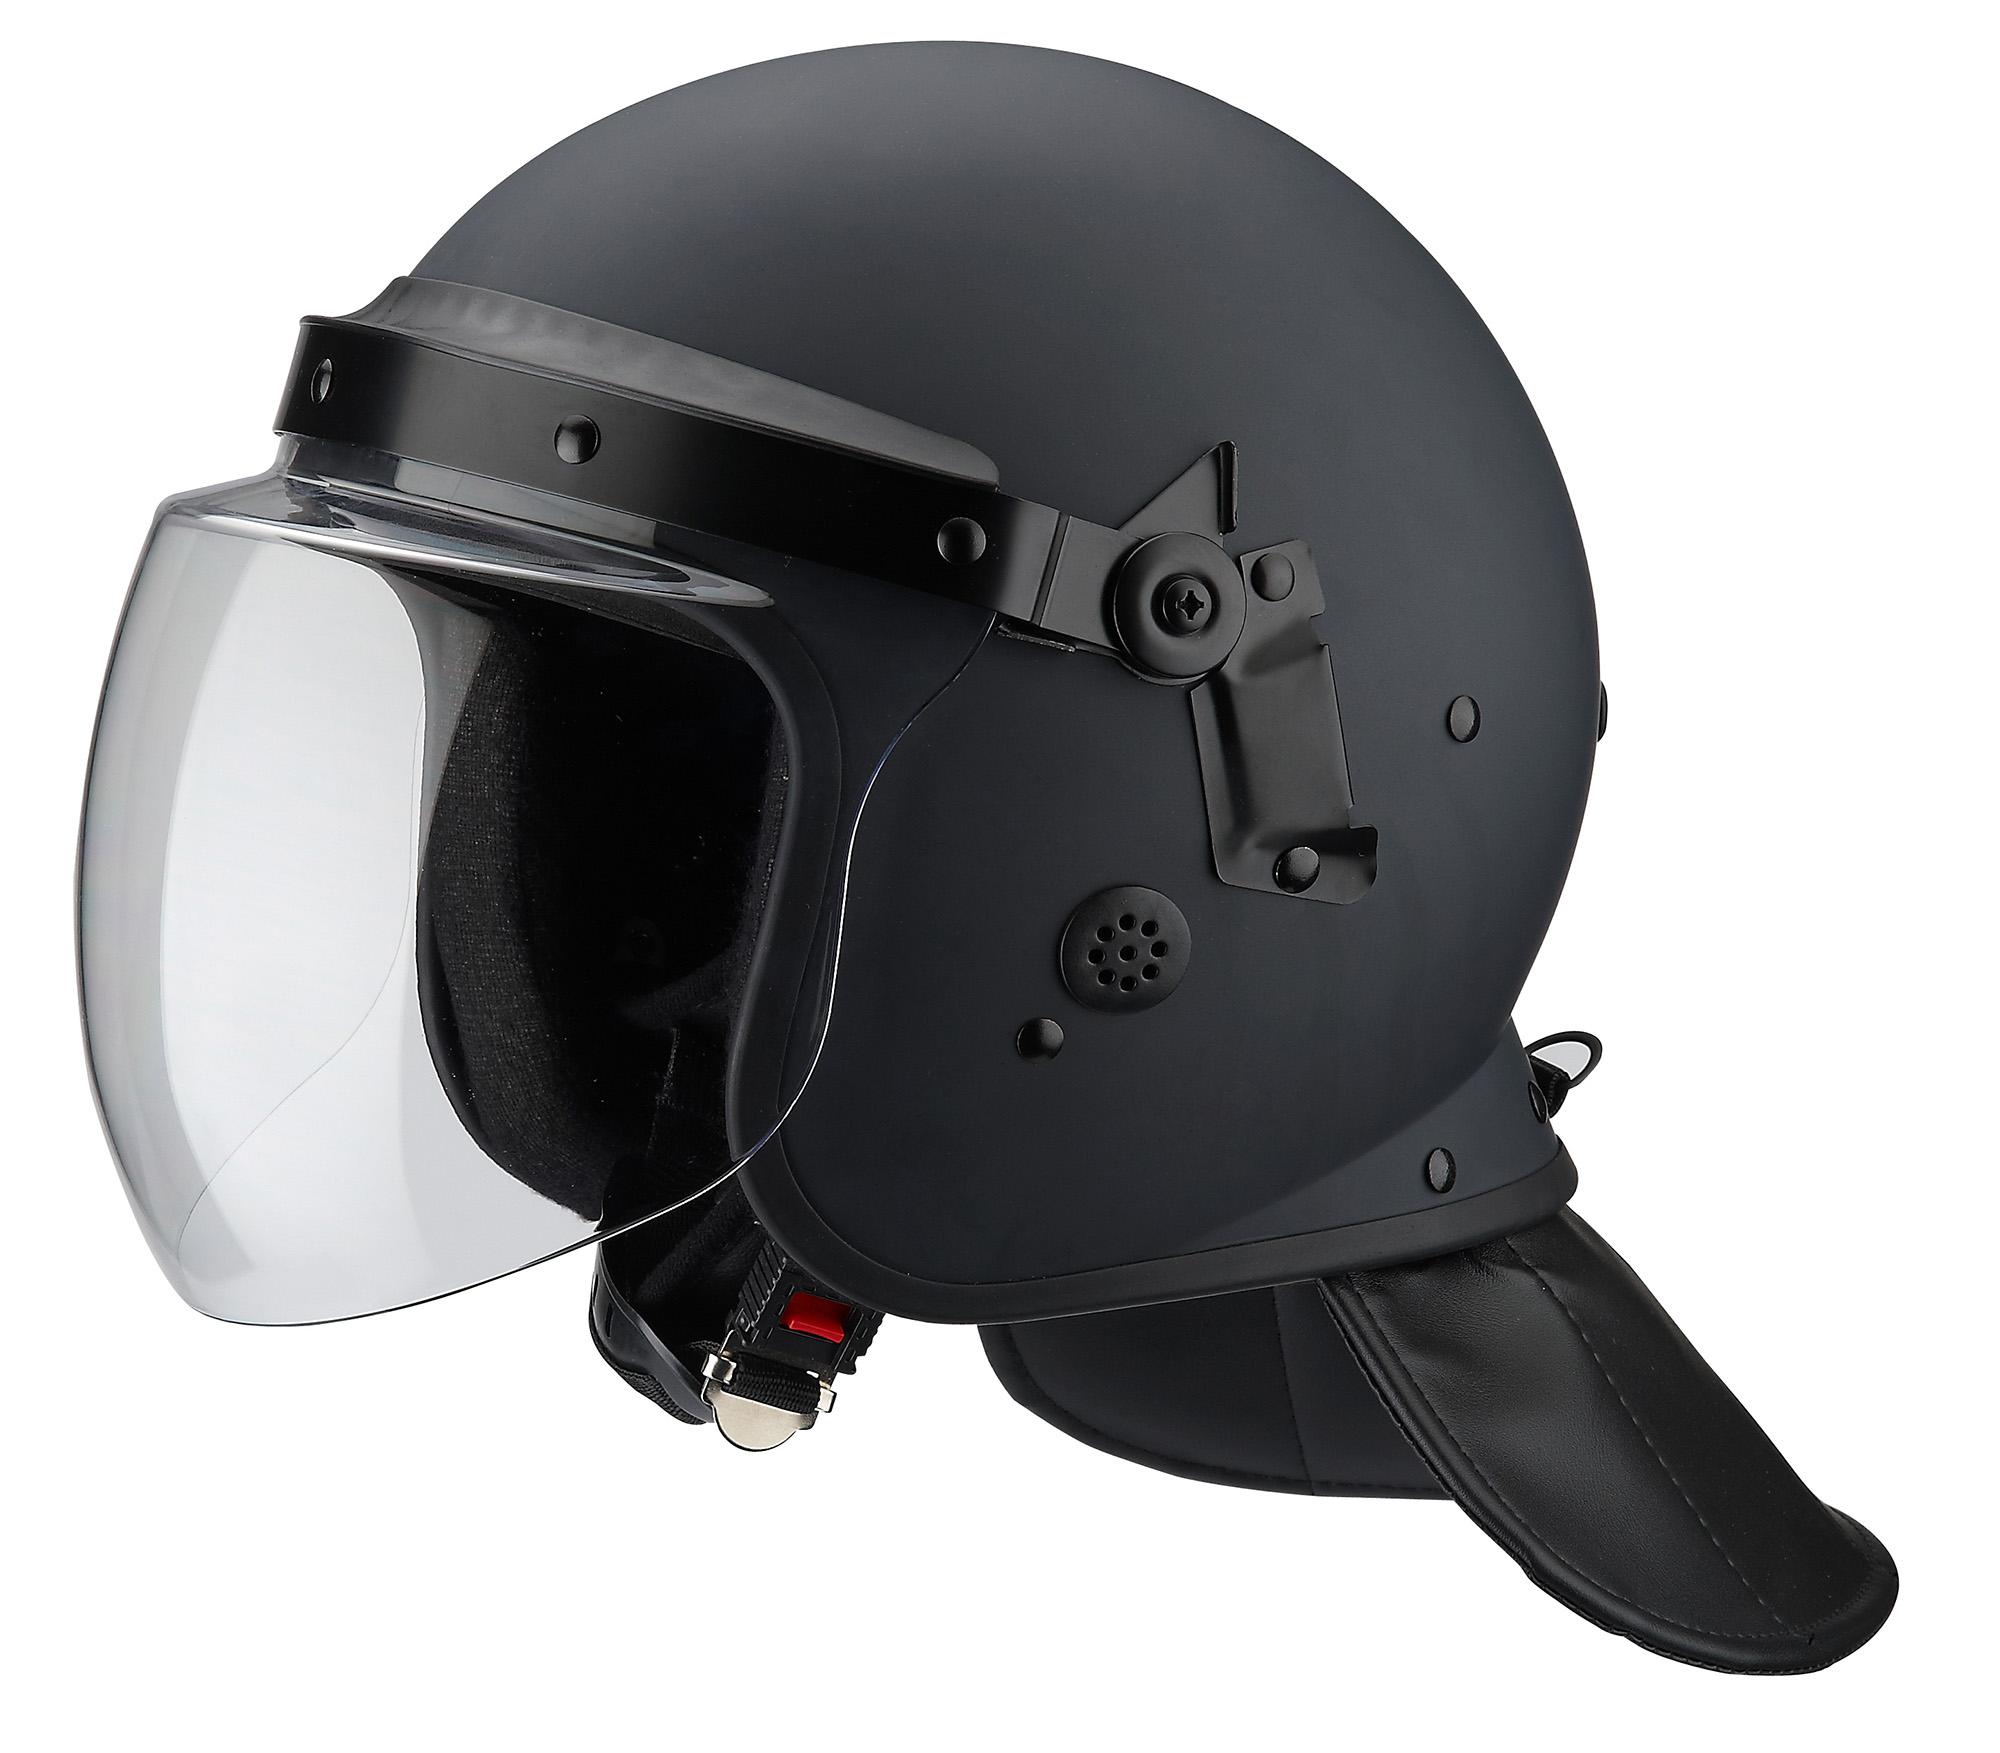 FBK 01 Riot Control Helmet Black 1